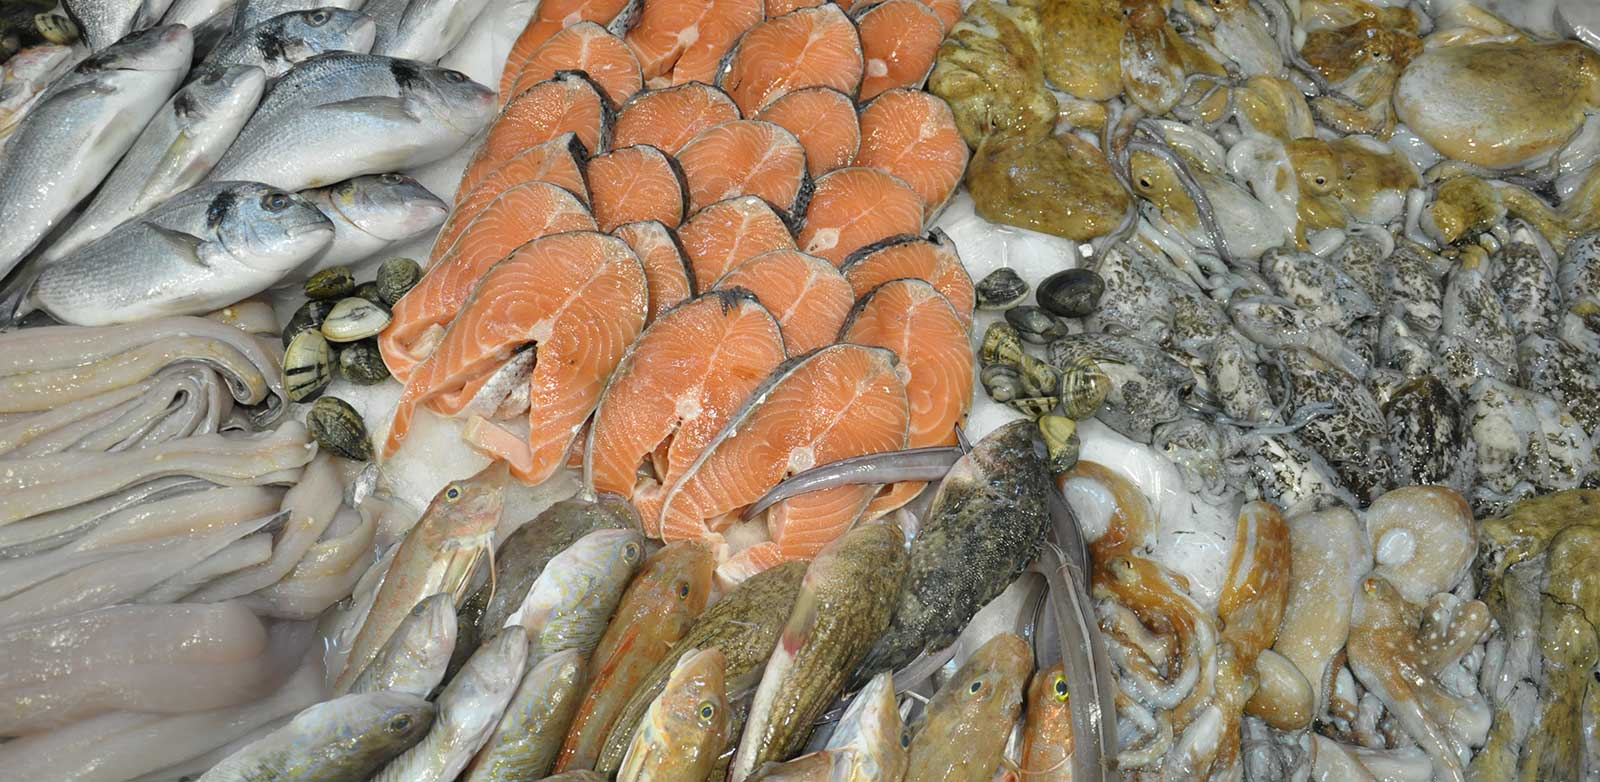 pescheria licata pesce fresco